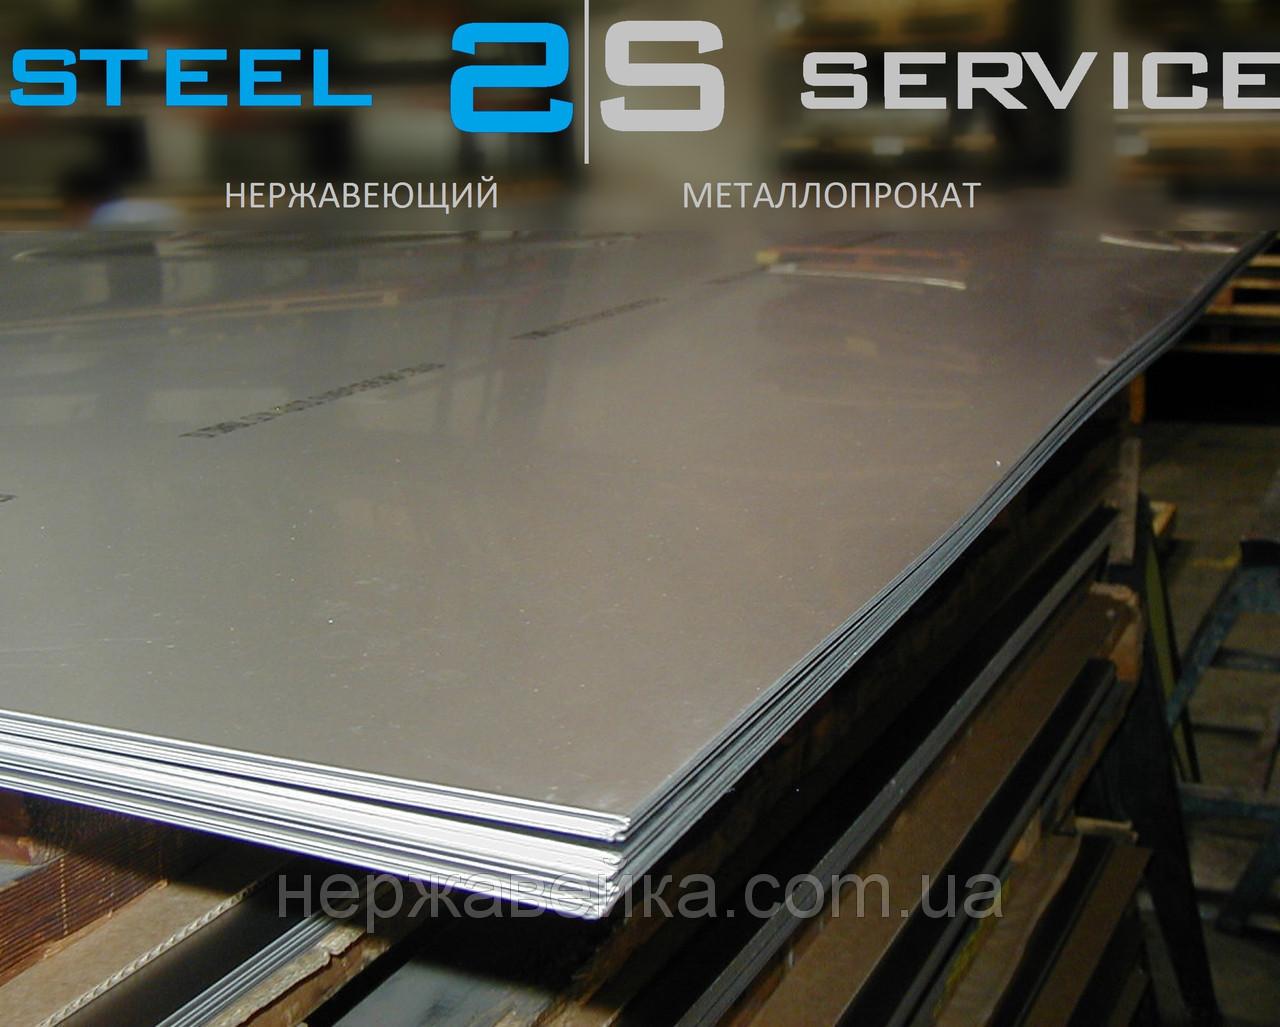 Нержавейка лист 16х1500х3000мм  AISI 316L(03Х17Н14М3) F1 - горячекатанный,  кислотостойкий